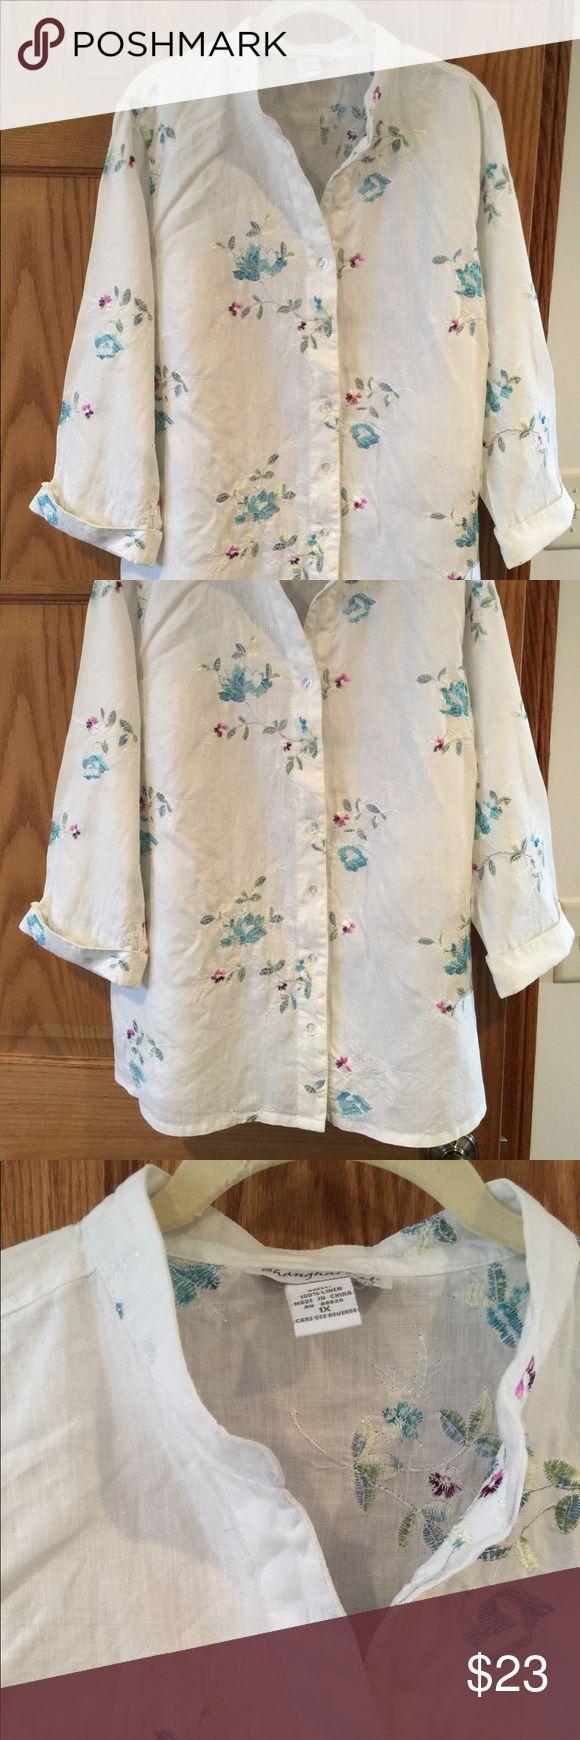 Linen Blouse With Embroidery 1x Linen Blouse Clothes Design Fashion Design